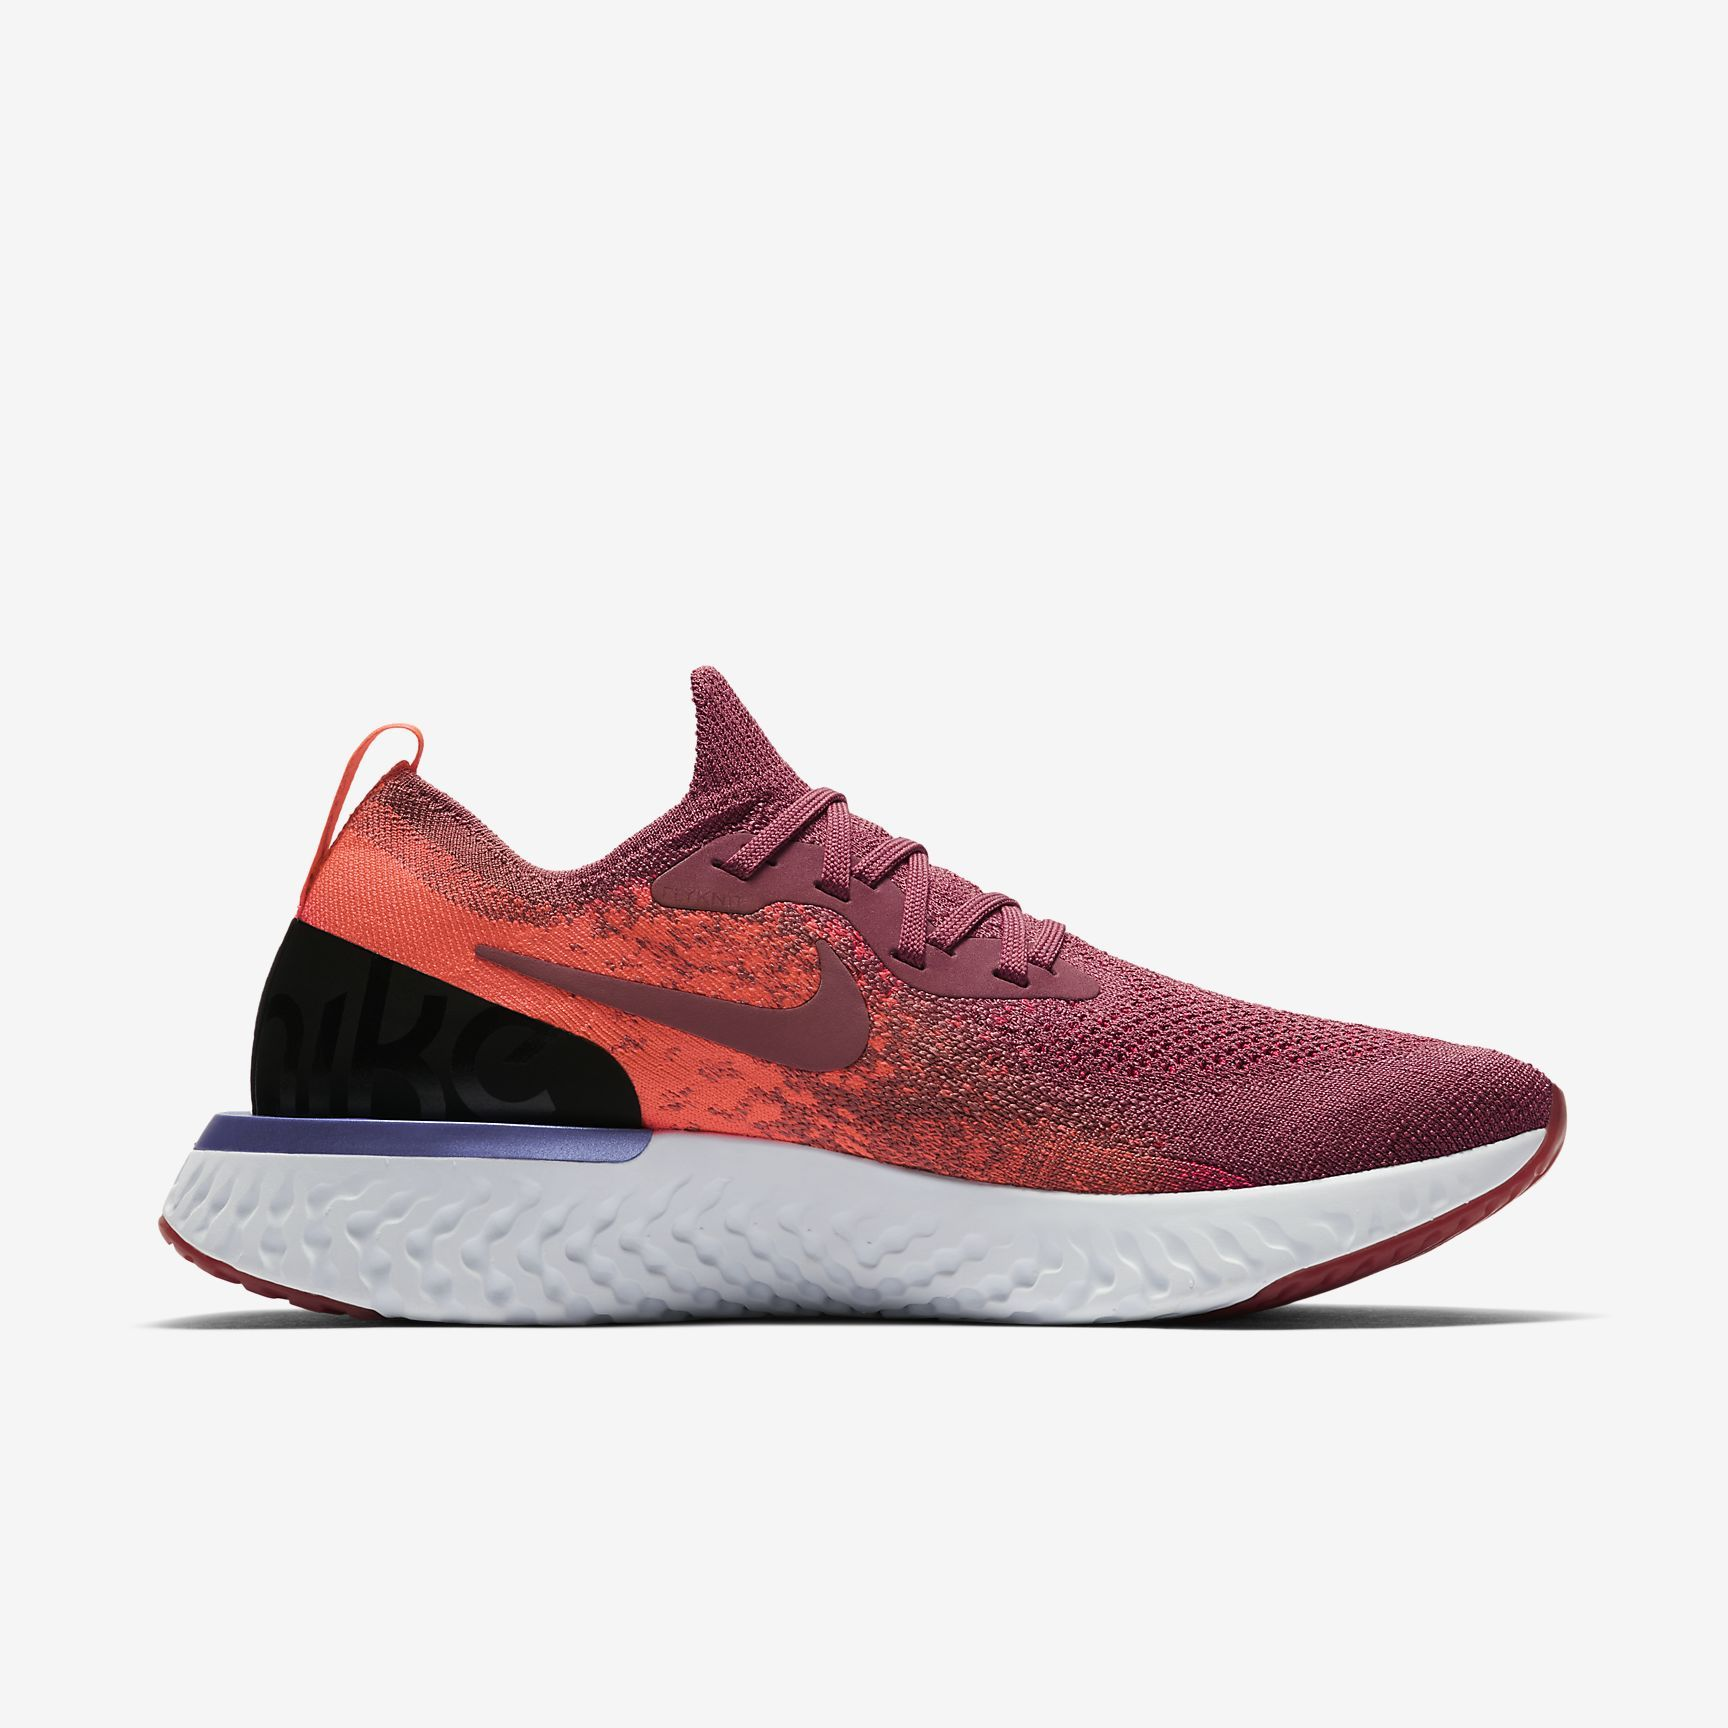 Nike Lady Epic React Flyknit in Berry